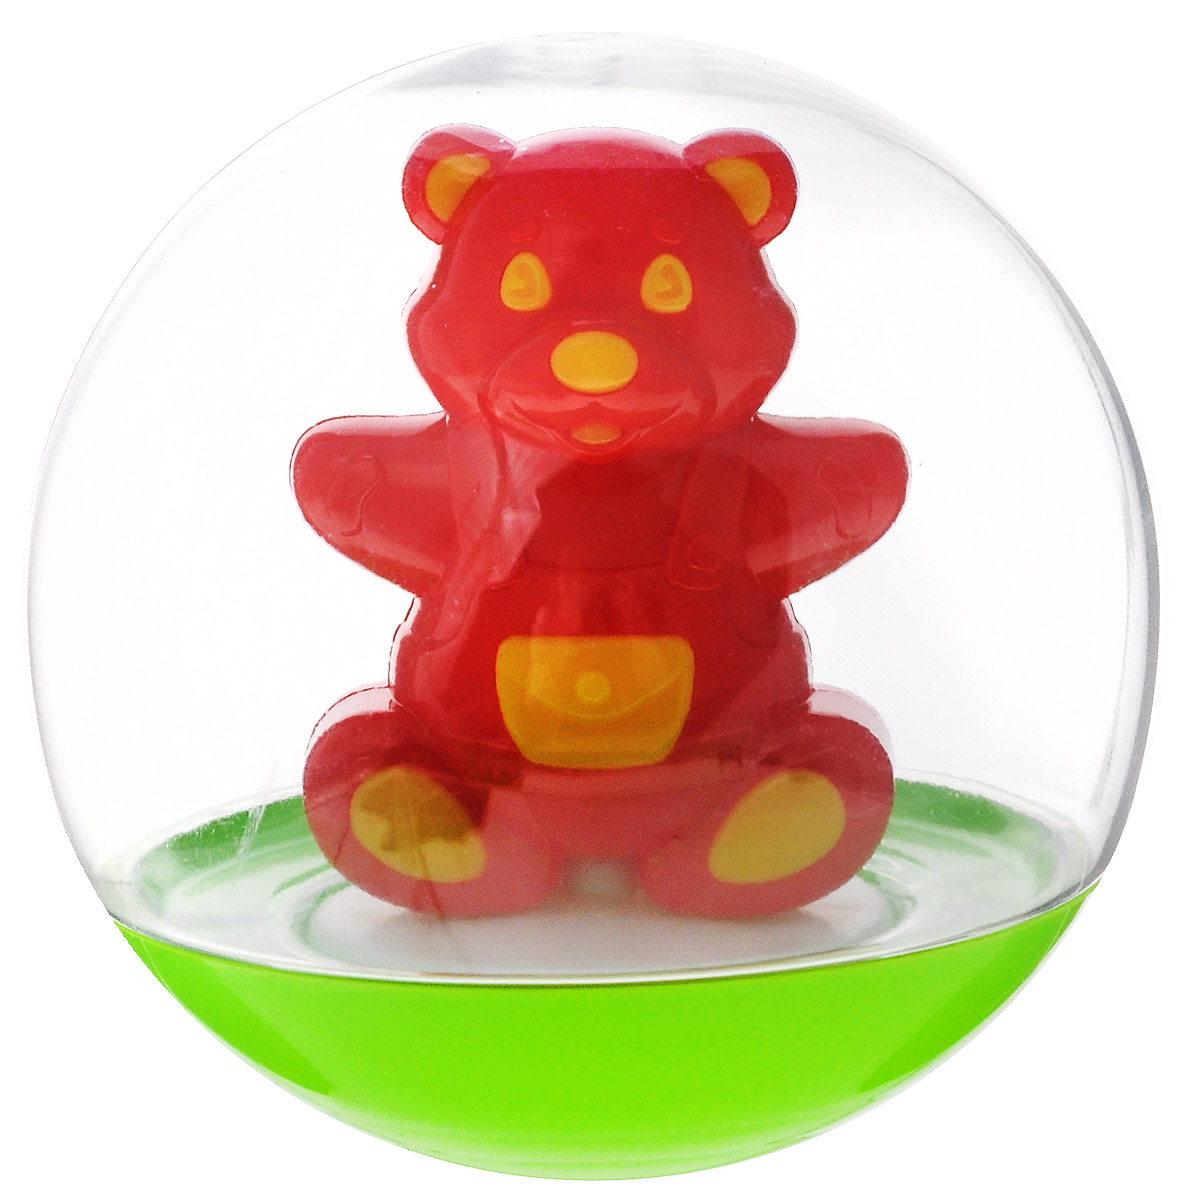 Stellar Погремушка-неваляшка Мишка цвет красный желтый